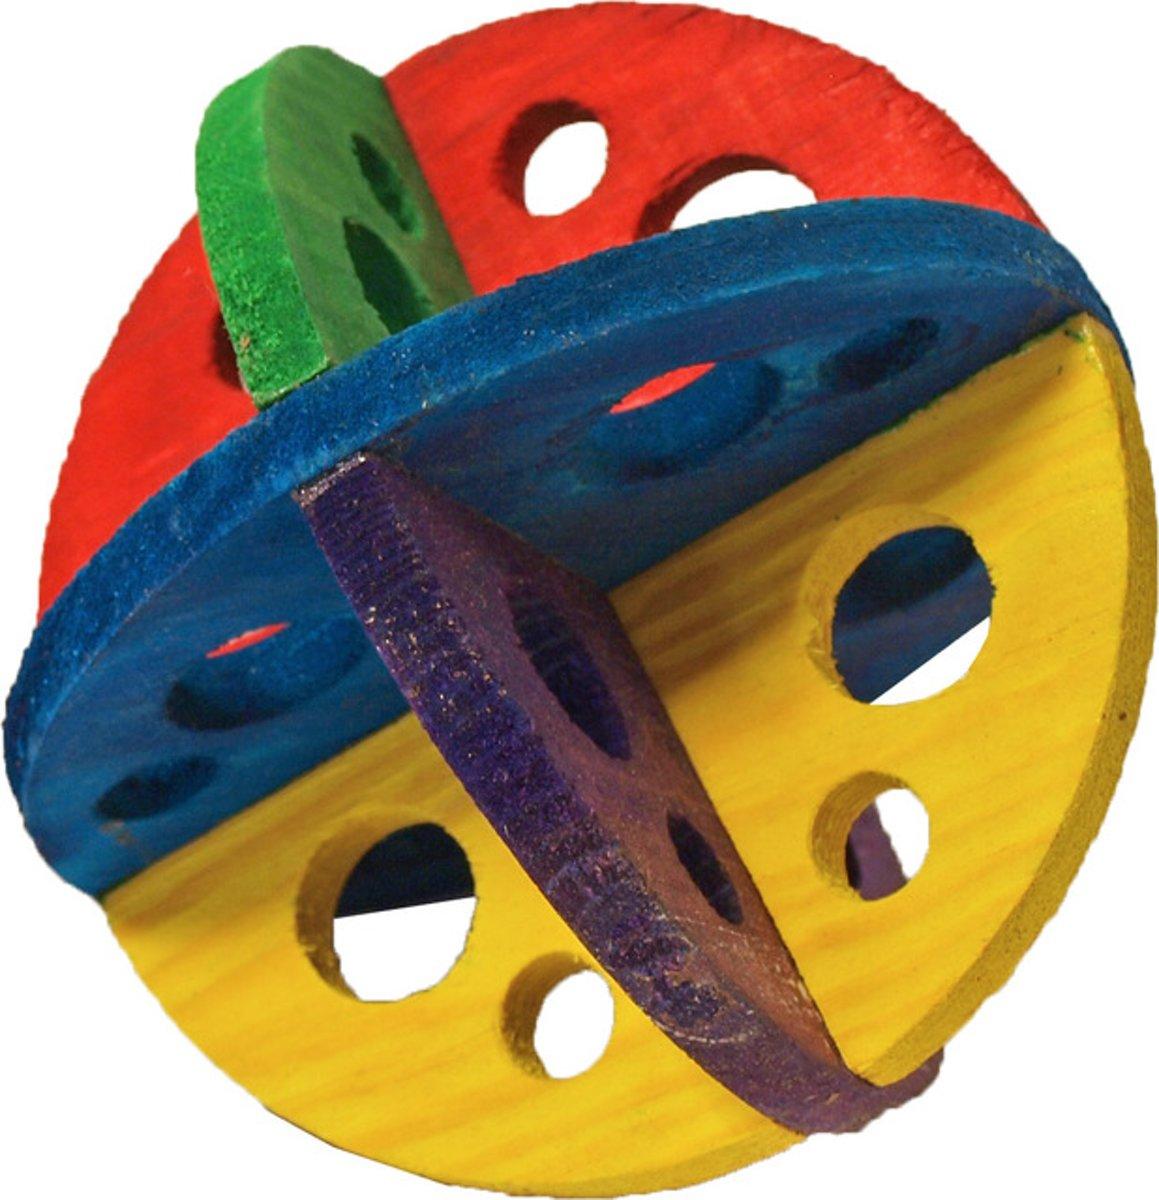 Houten knaagdierspeelgoed bal 14 cm